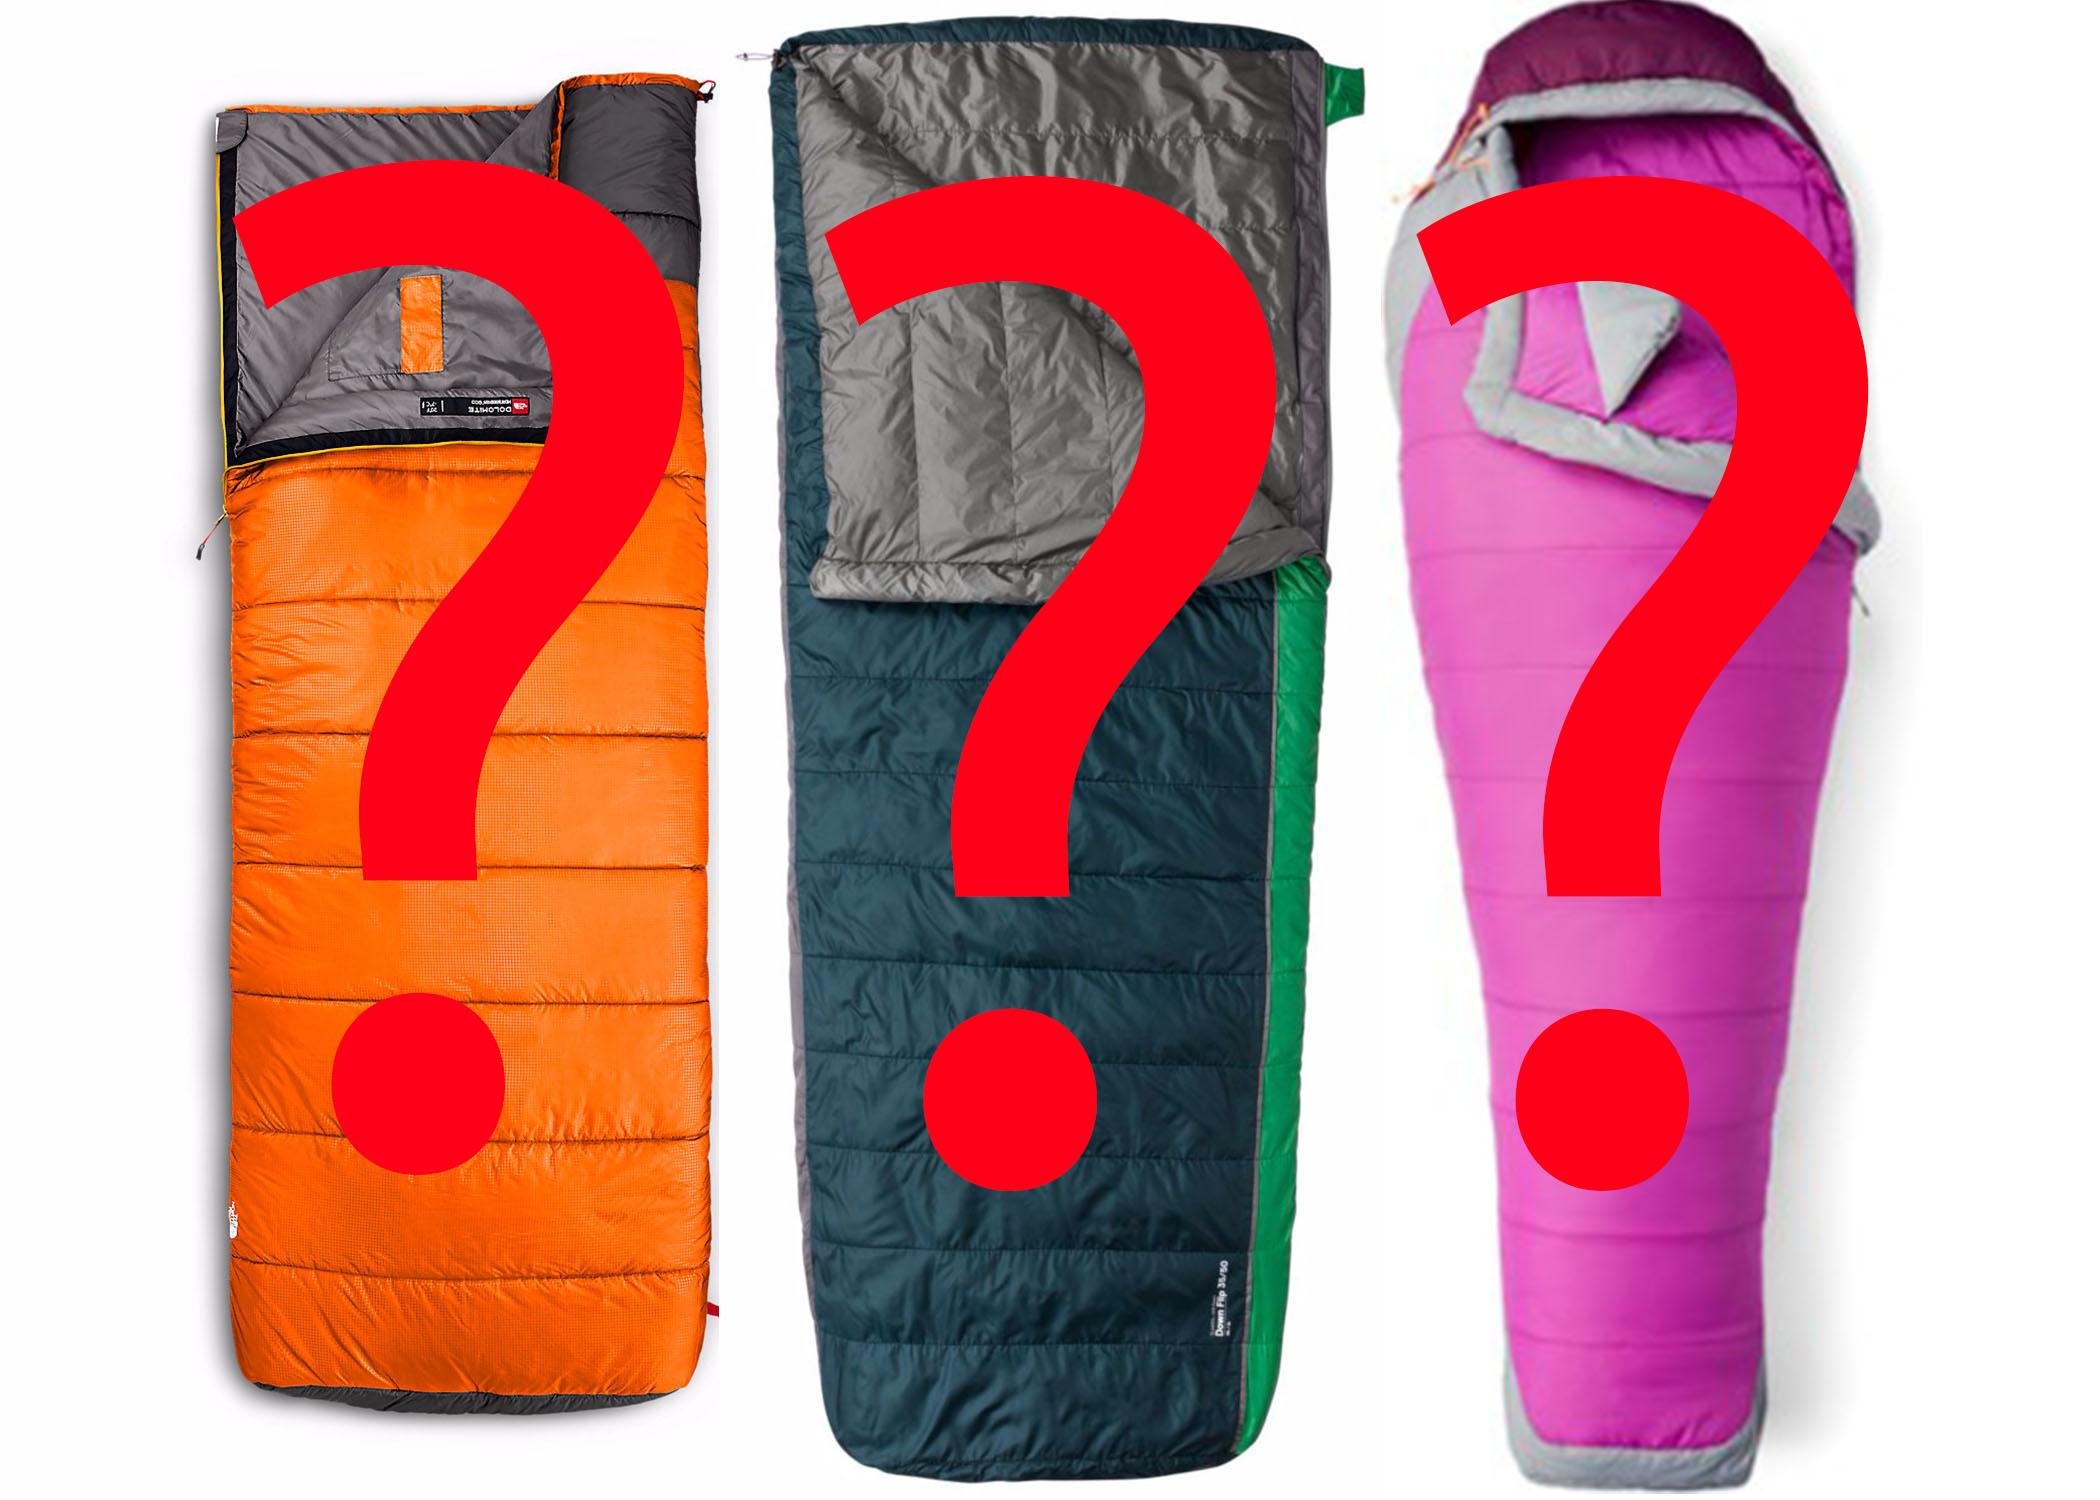 Choosing a sleeping bag isn't as difficult as it may first seem.